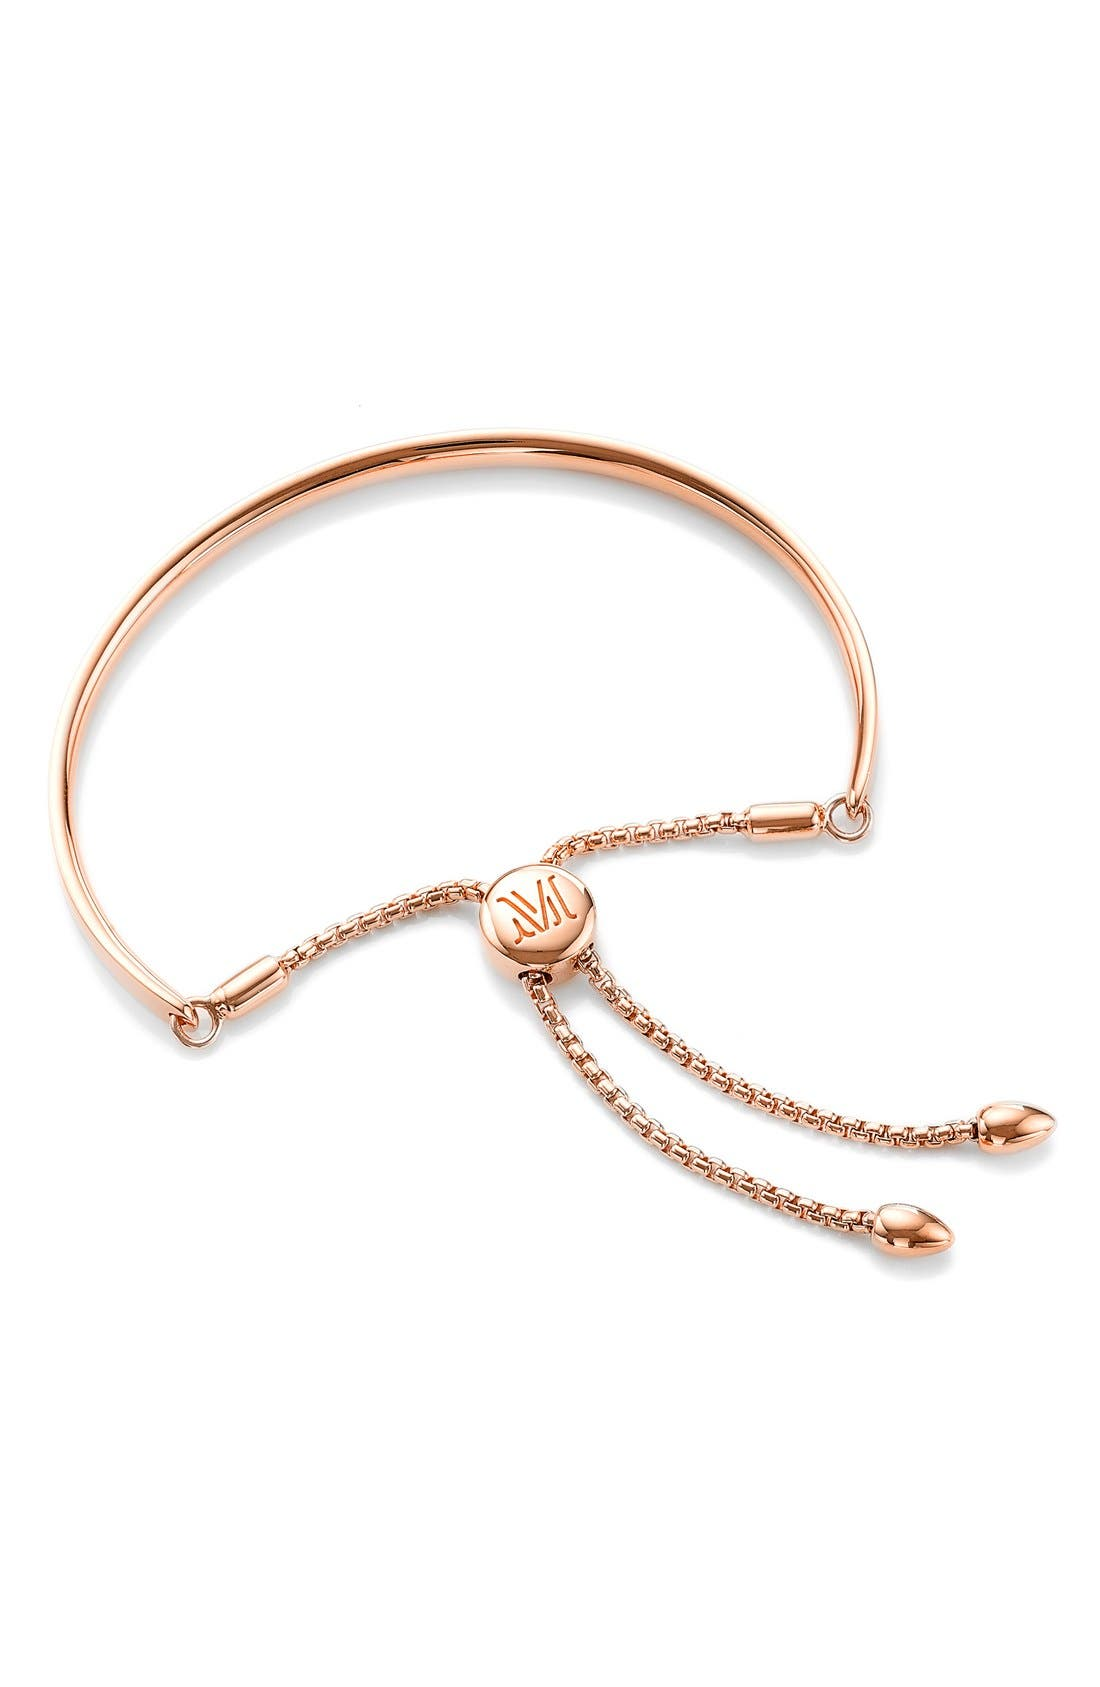 Fiji Chain Bracelet,                         Main,                         color, ROSE GOLD